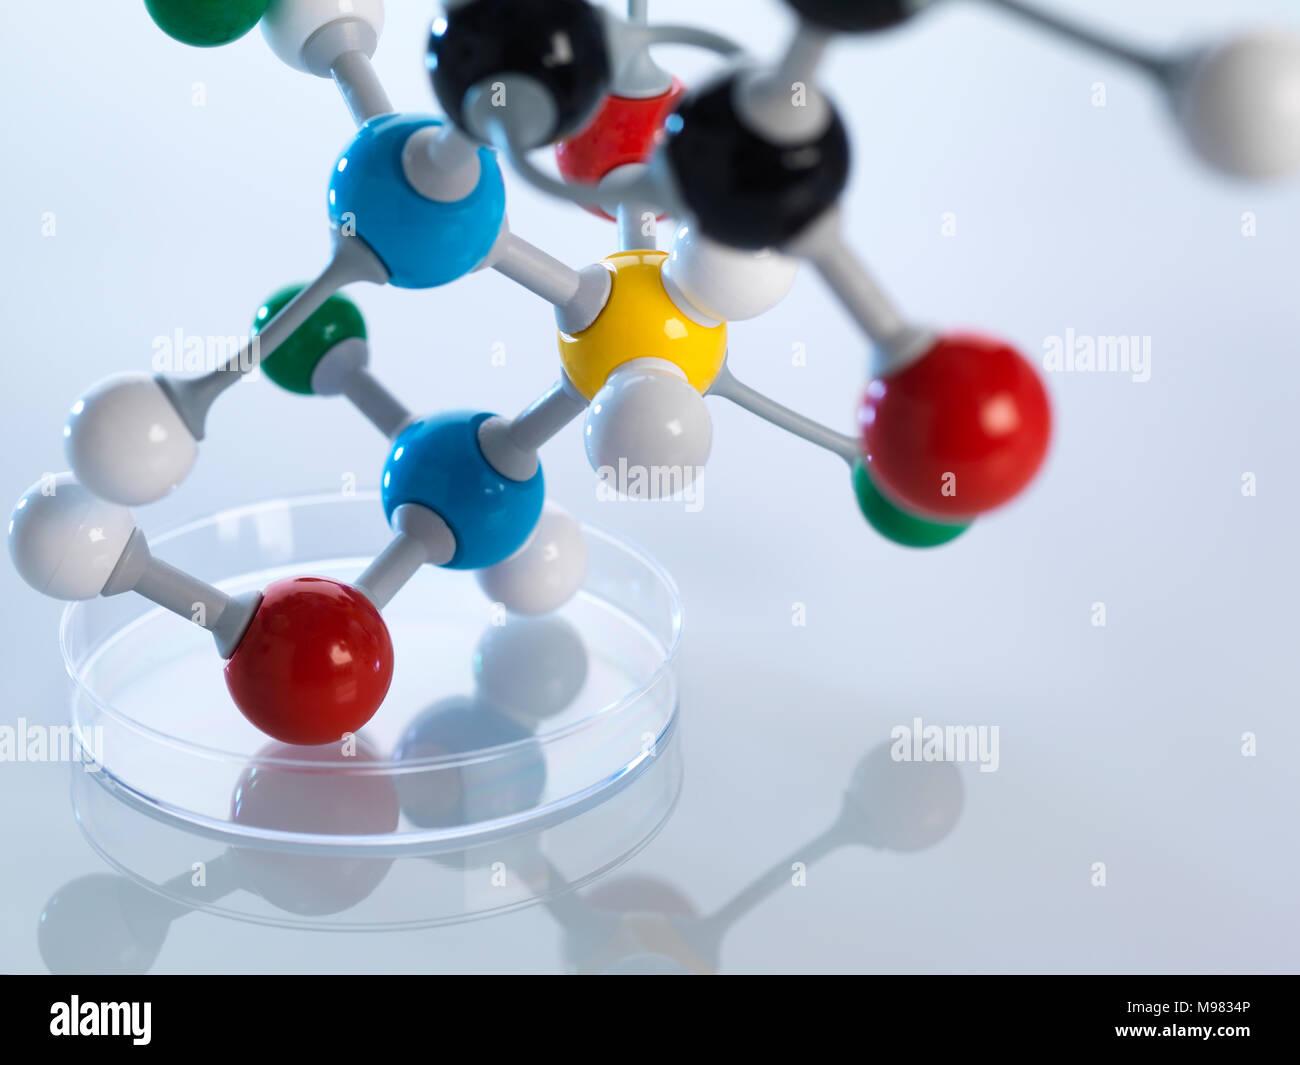 Molecular model in petri dish - Stock Image